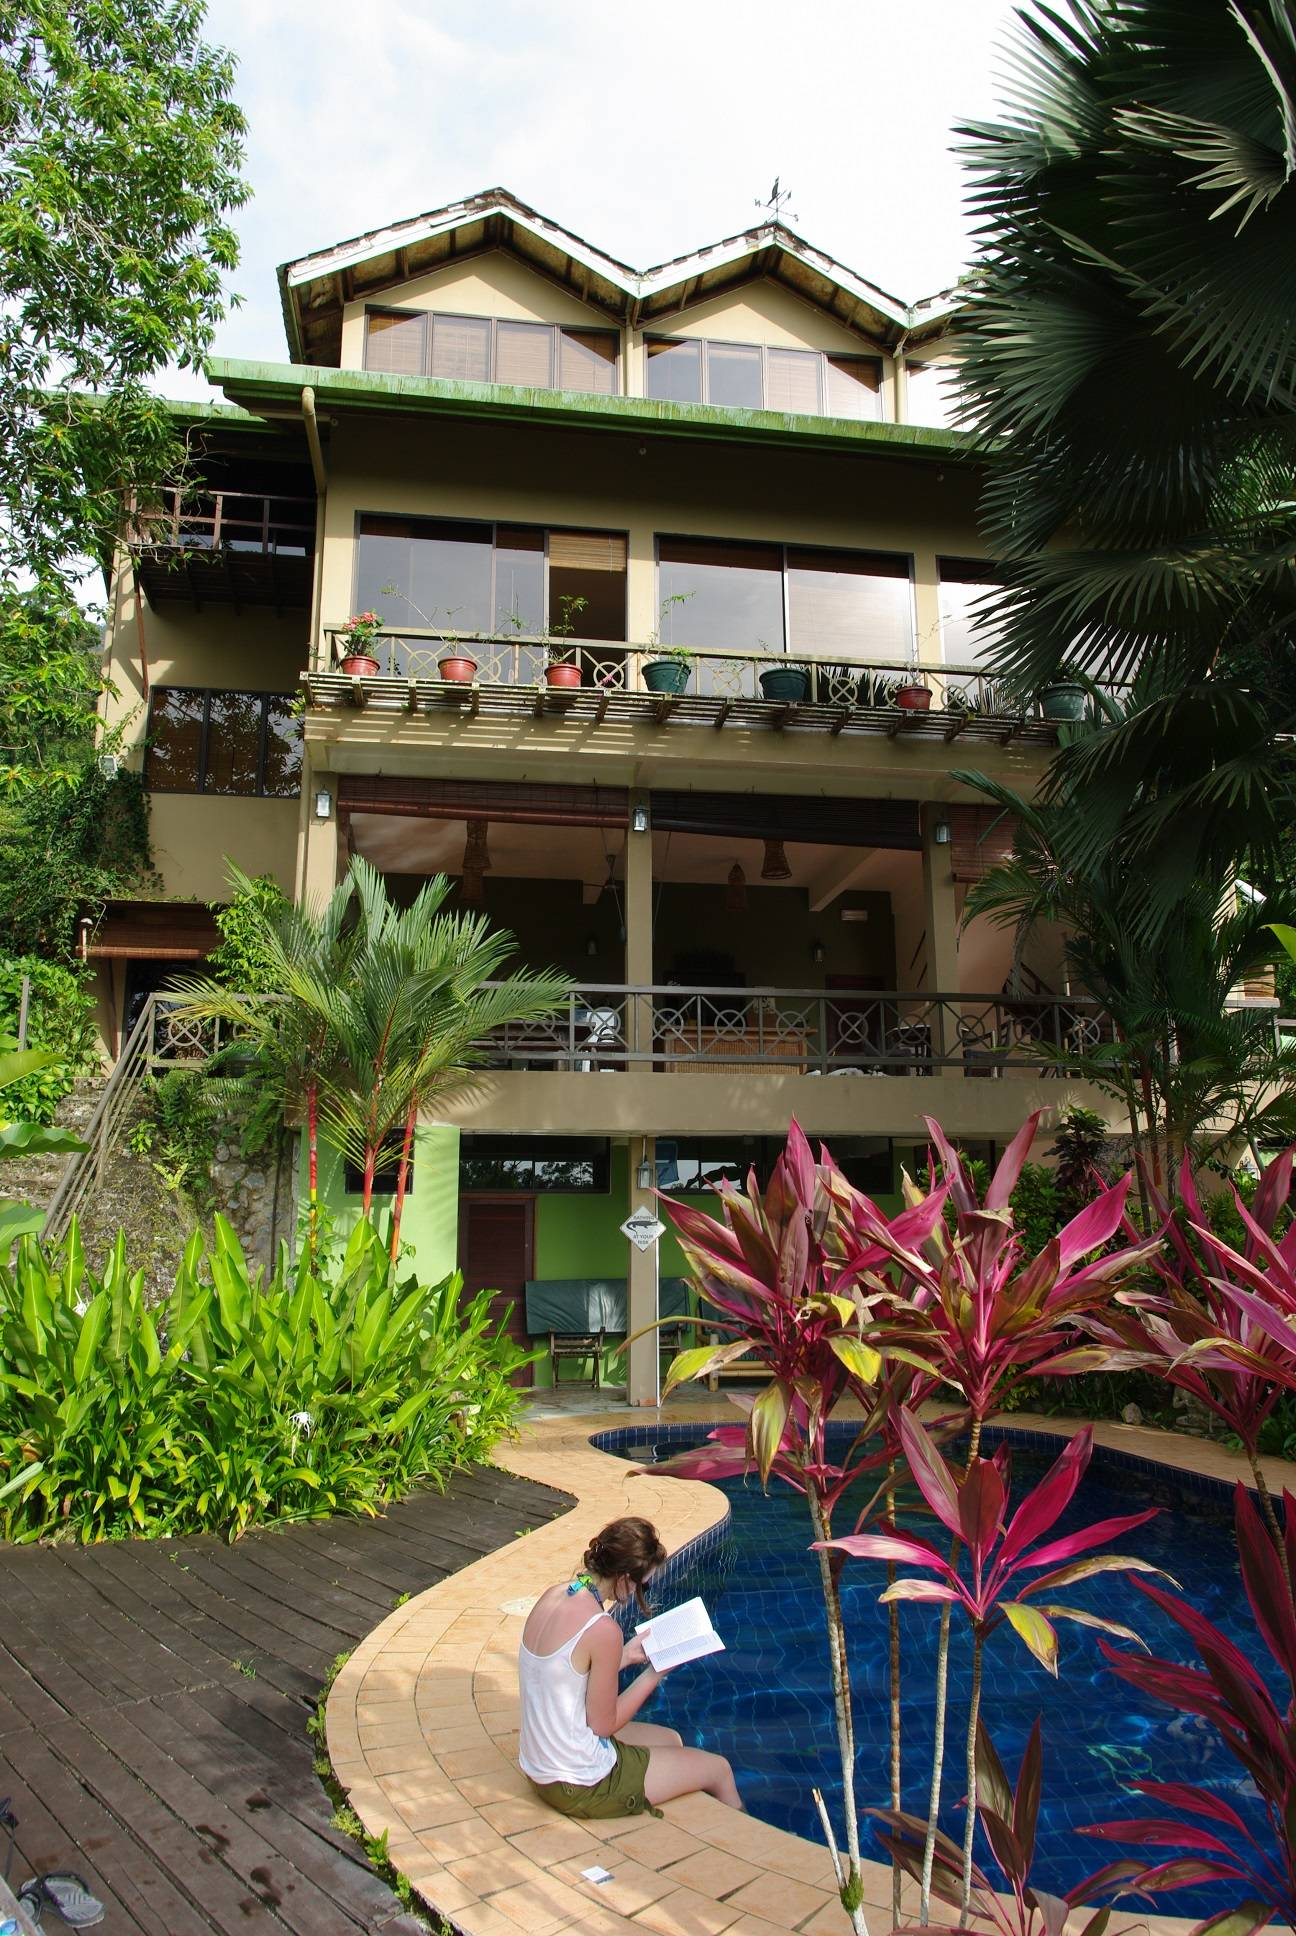 Photo 1: Meilleur hébergement du Sarawak (Bornéo)